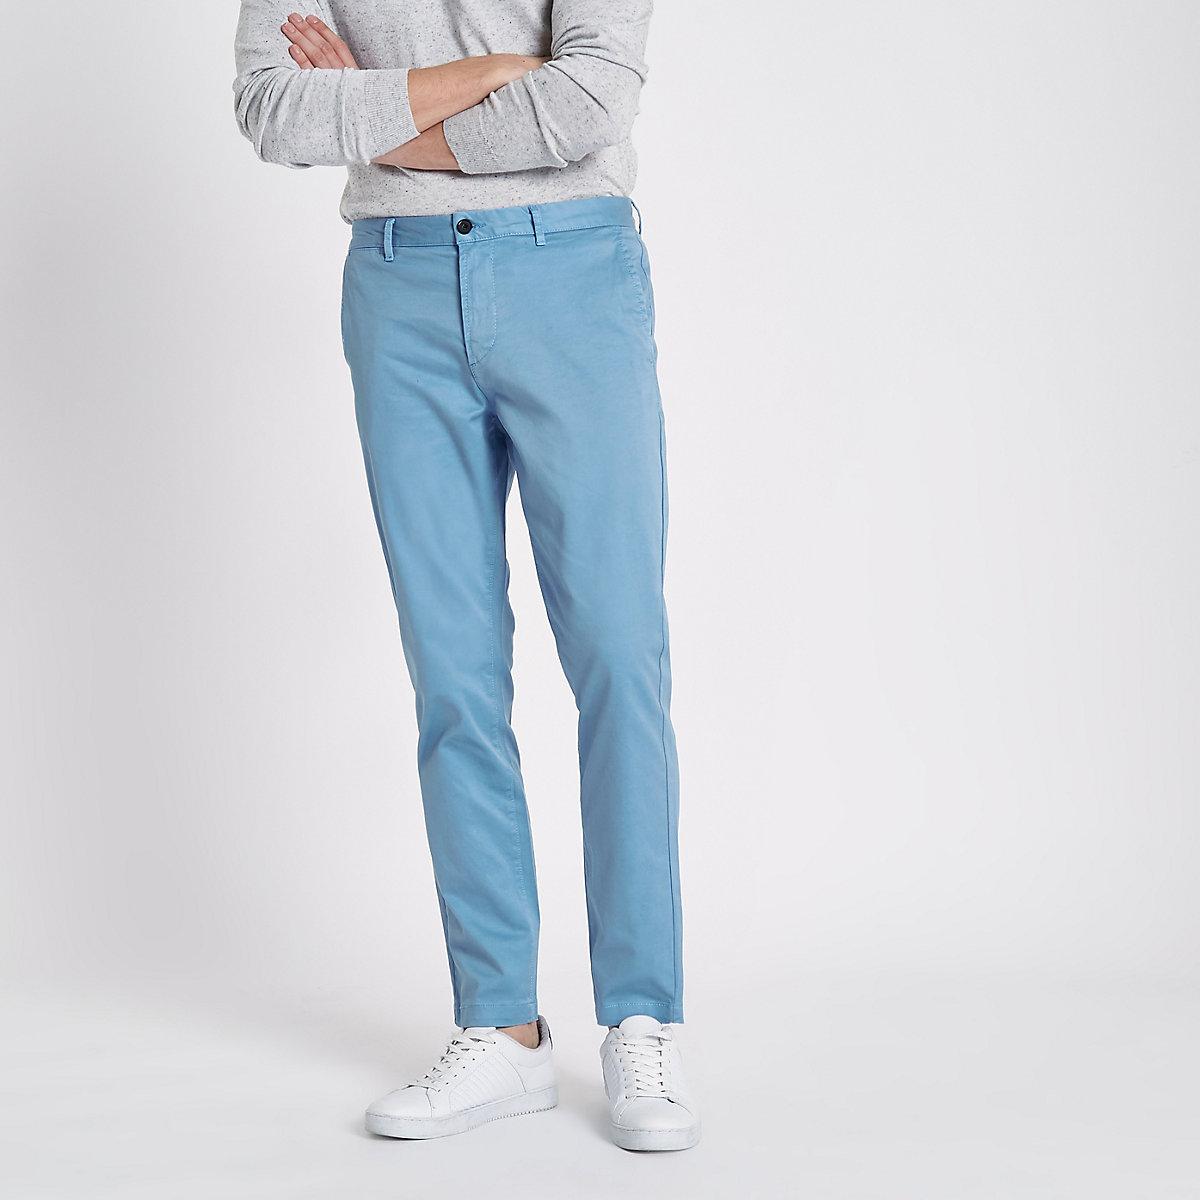 Light blue slim fit chino pants